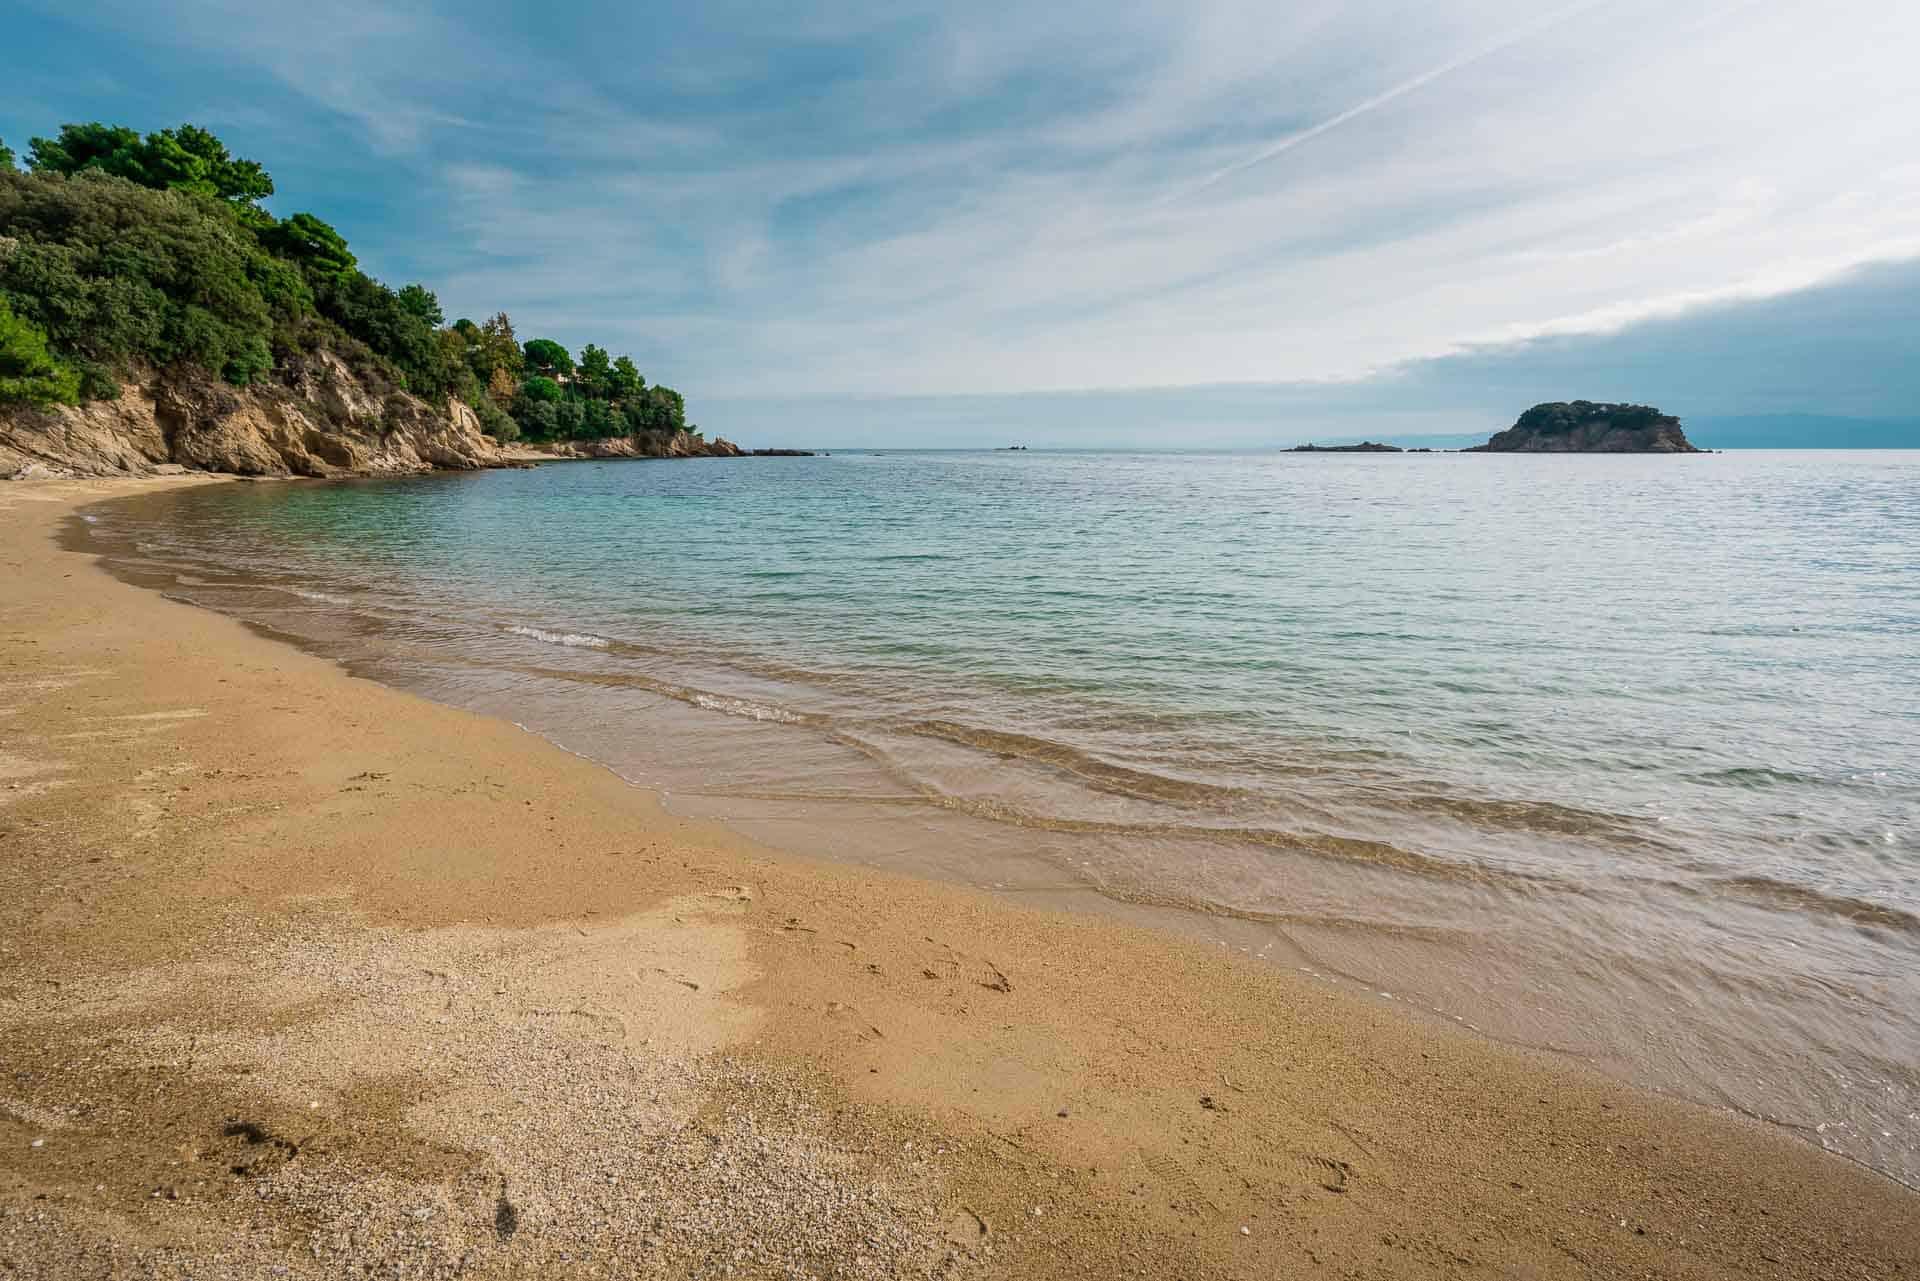 koukounaries beach - place to visit in skiathos